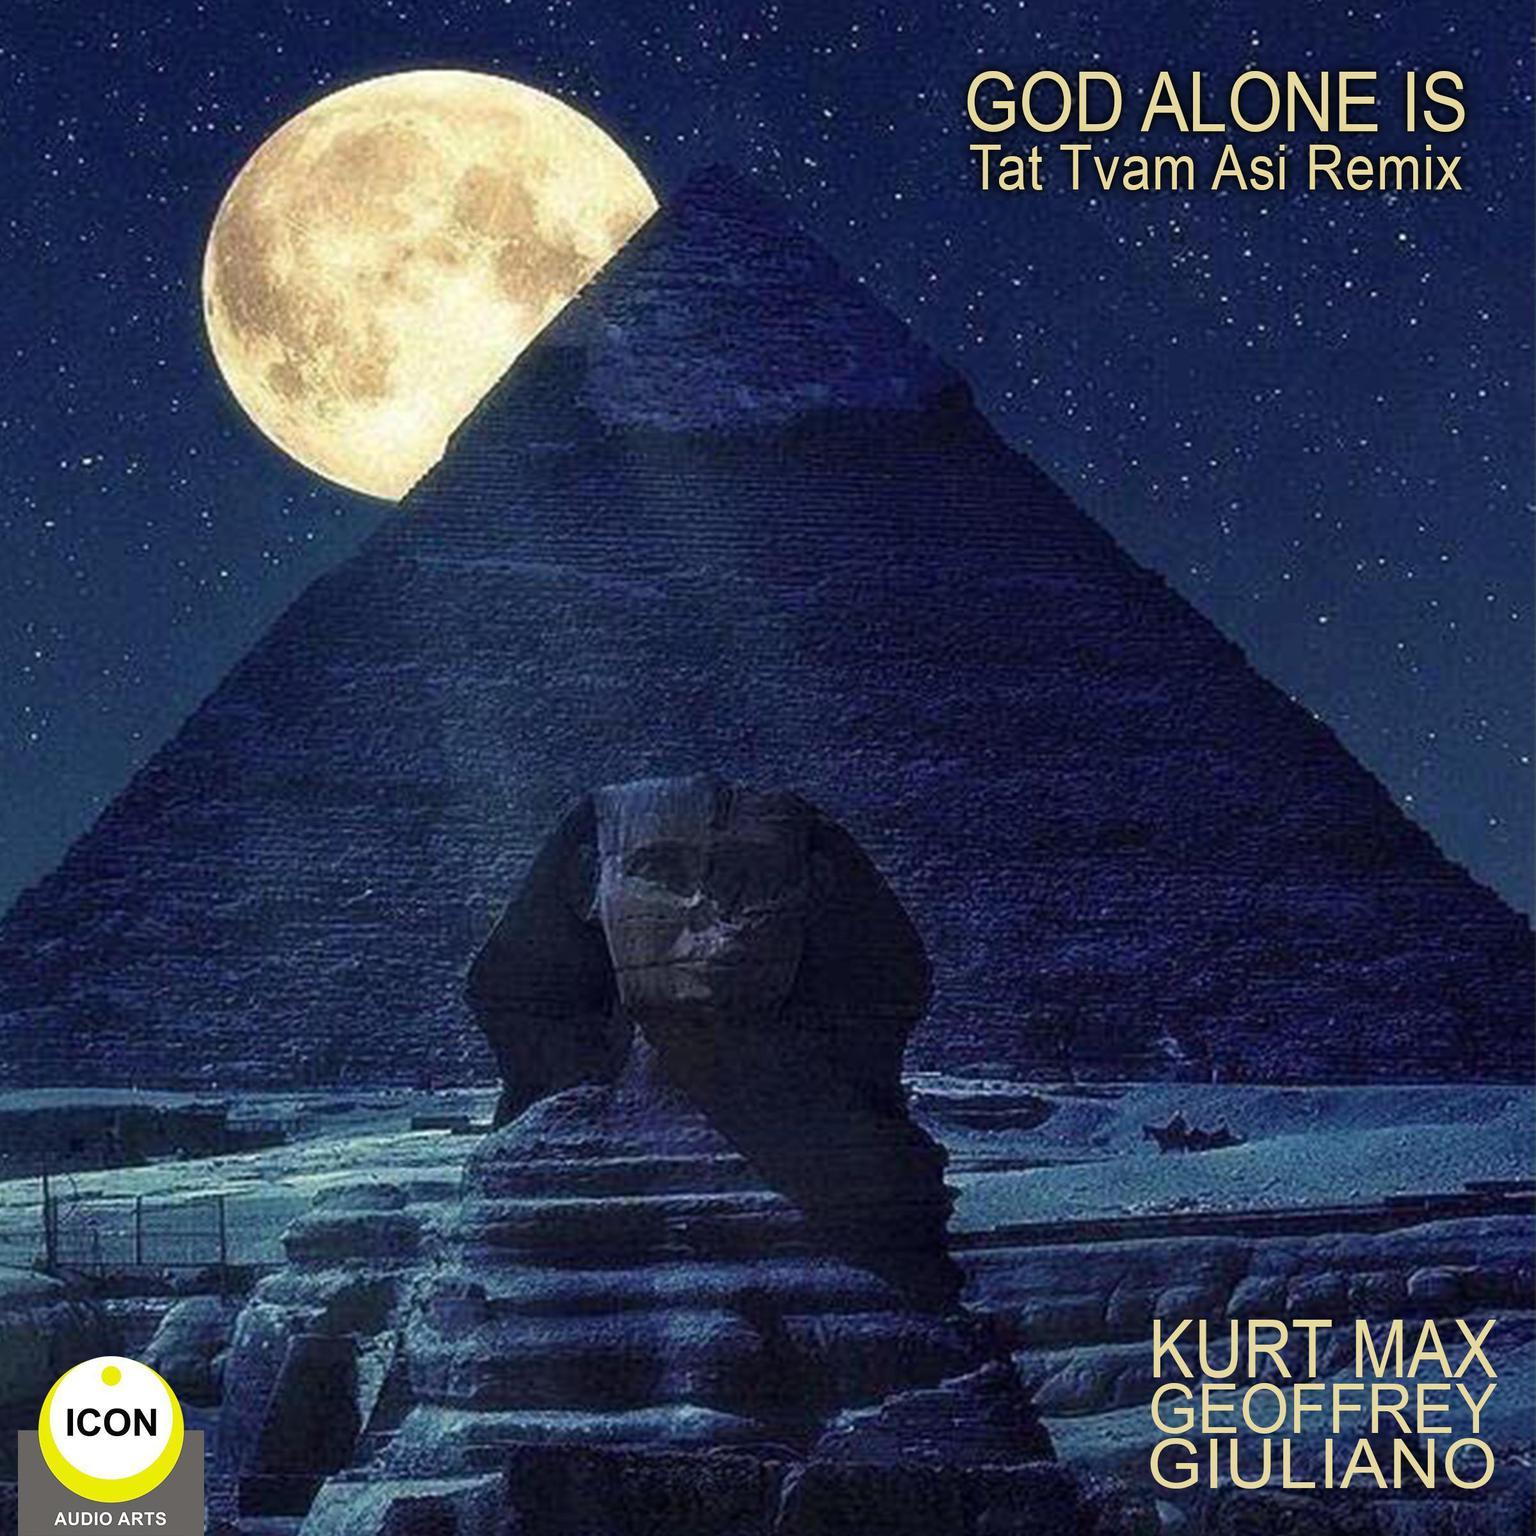 Printable God Alone Is - Tat Tvam Asi Remix Audiobook Cover Art